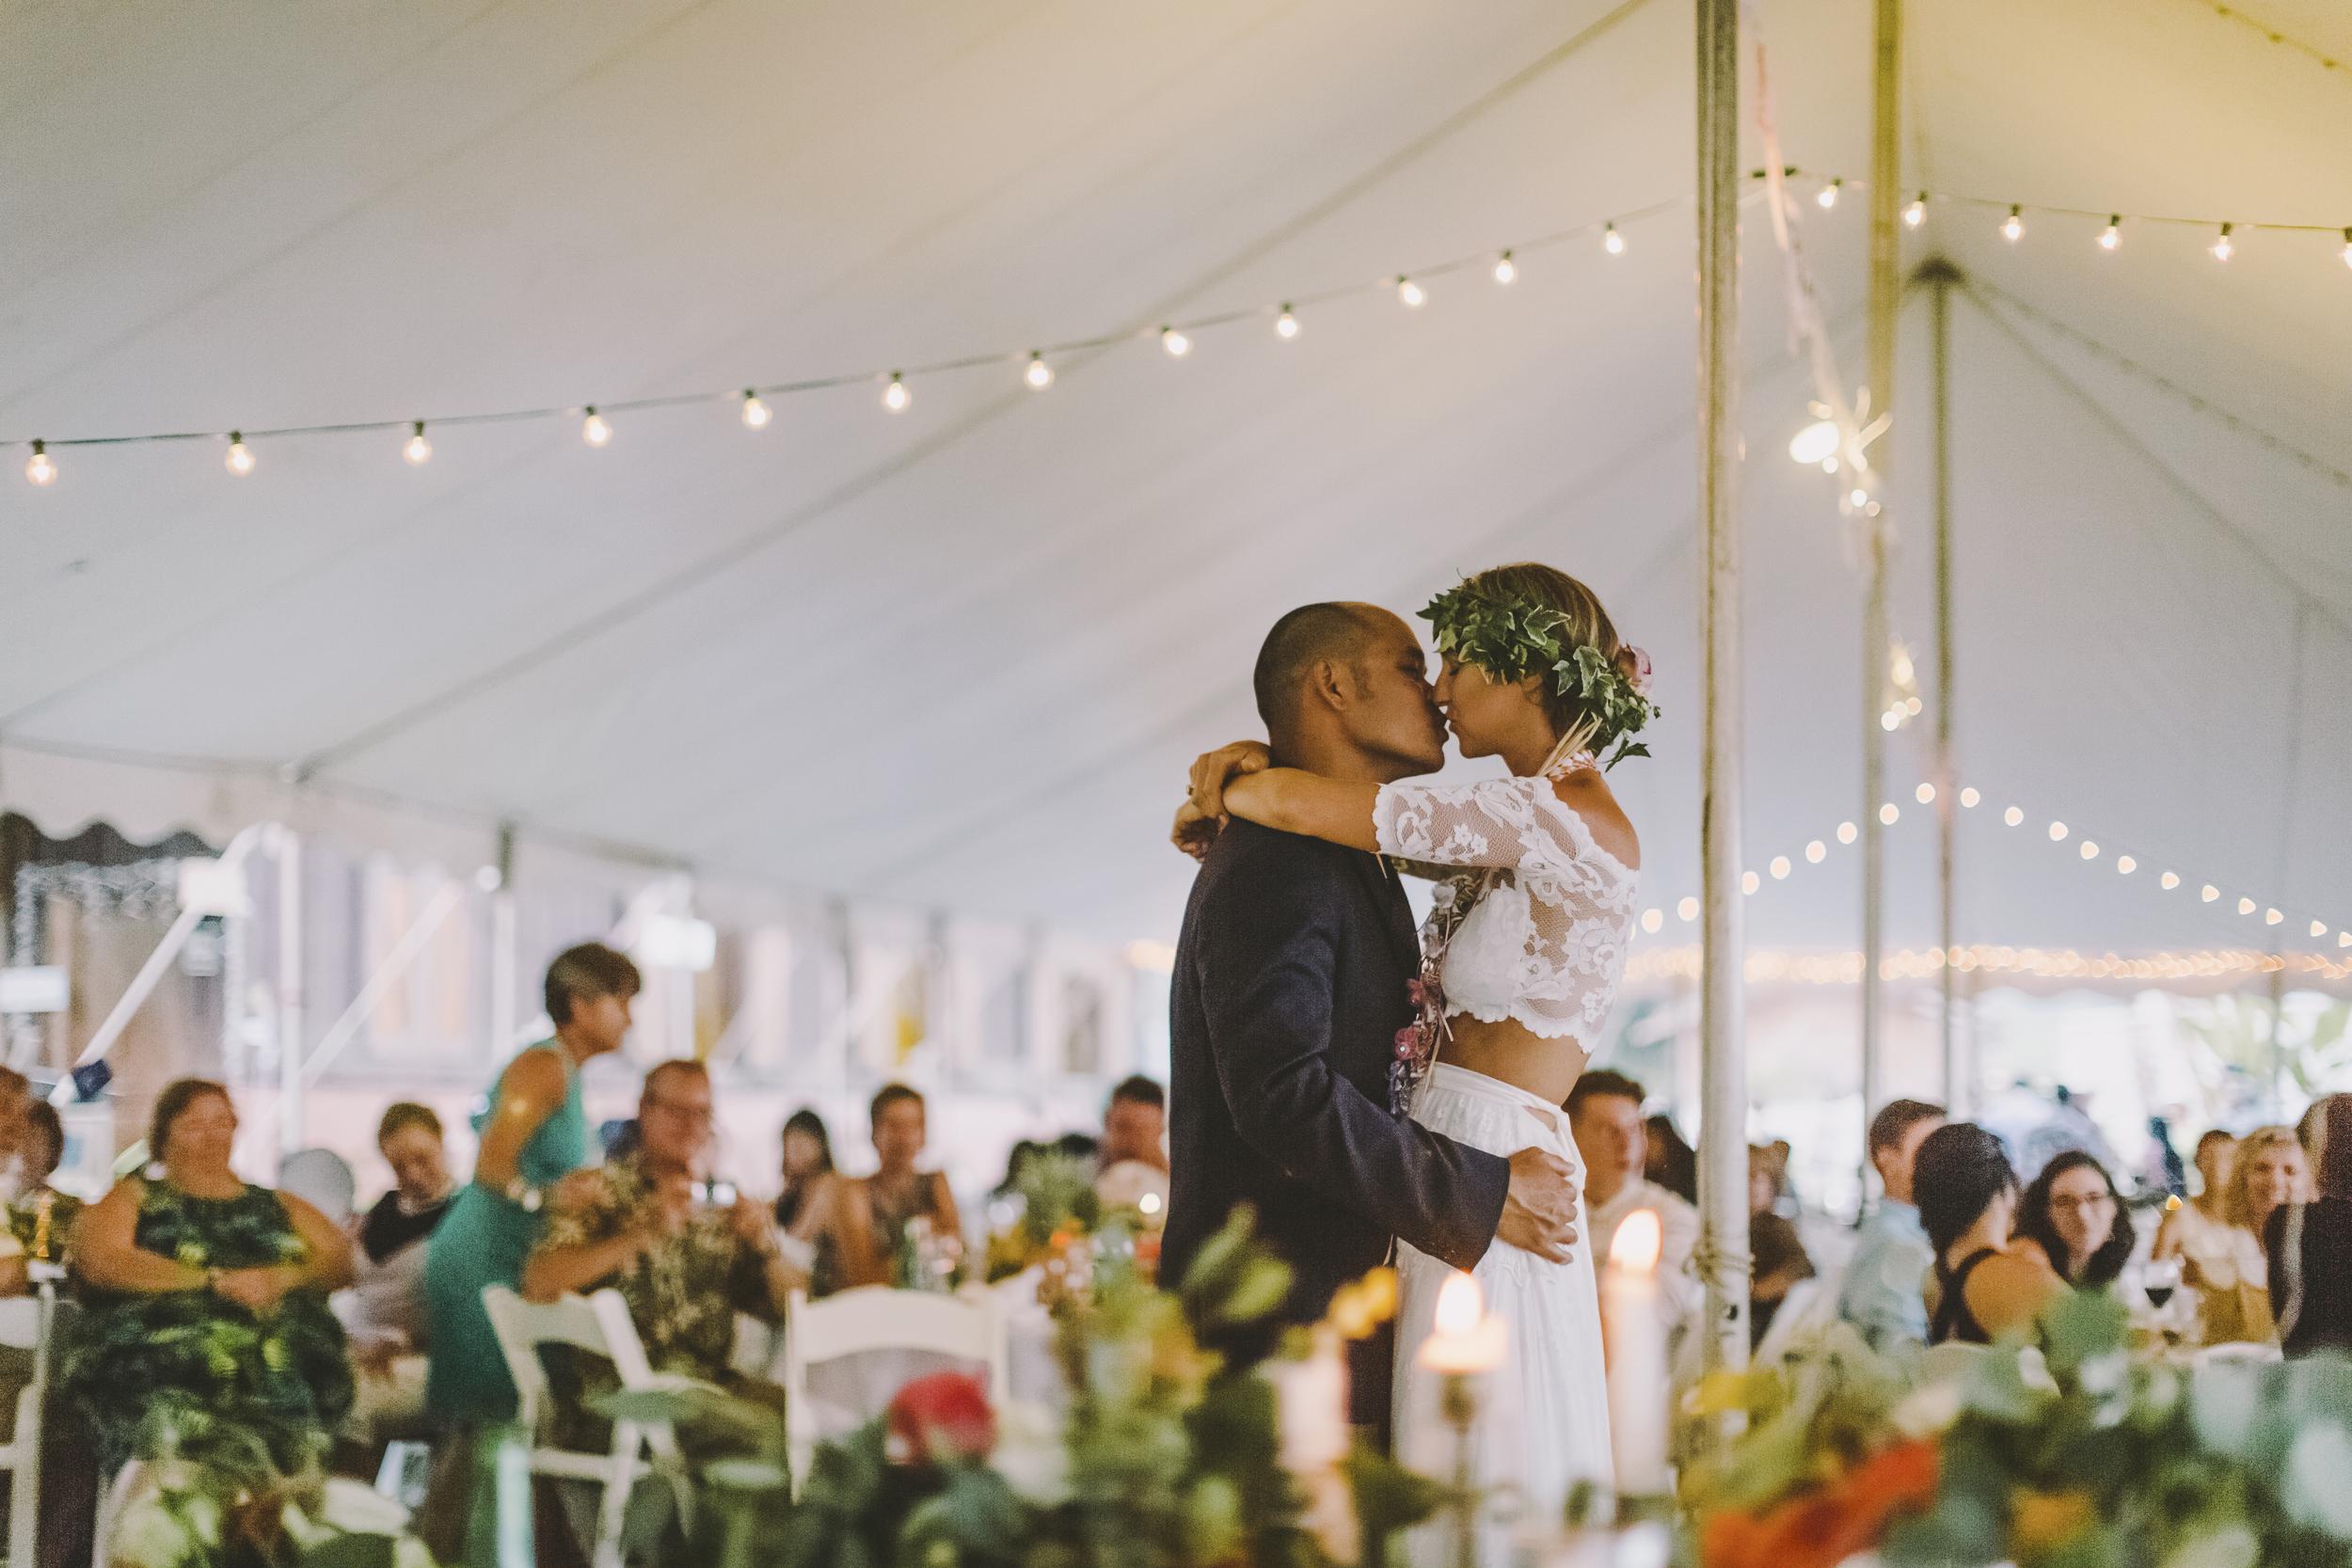 angie-diaz-photography-oahu-hawaii-wedding-tradewinds-ranch-104.jpg